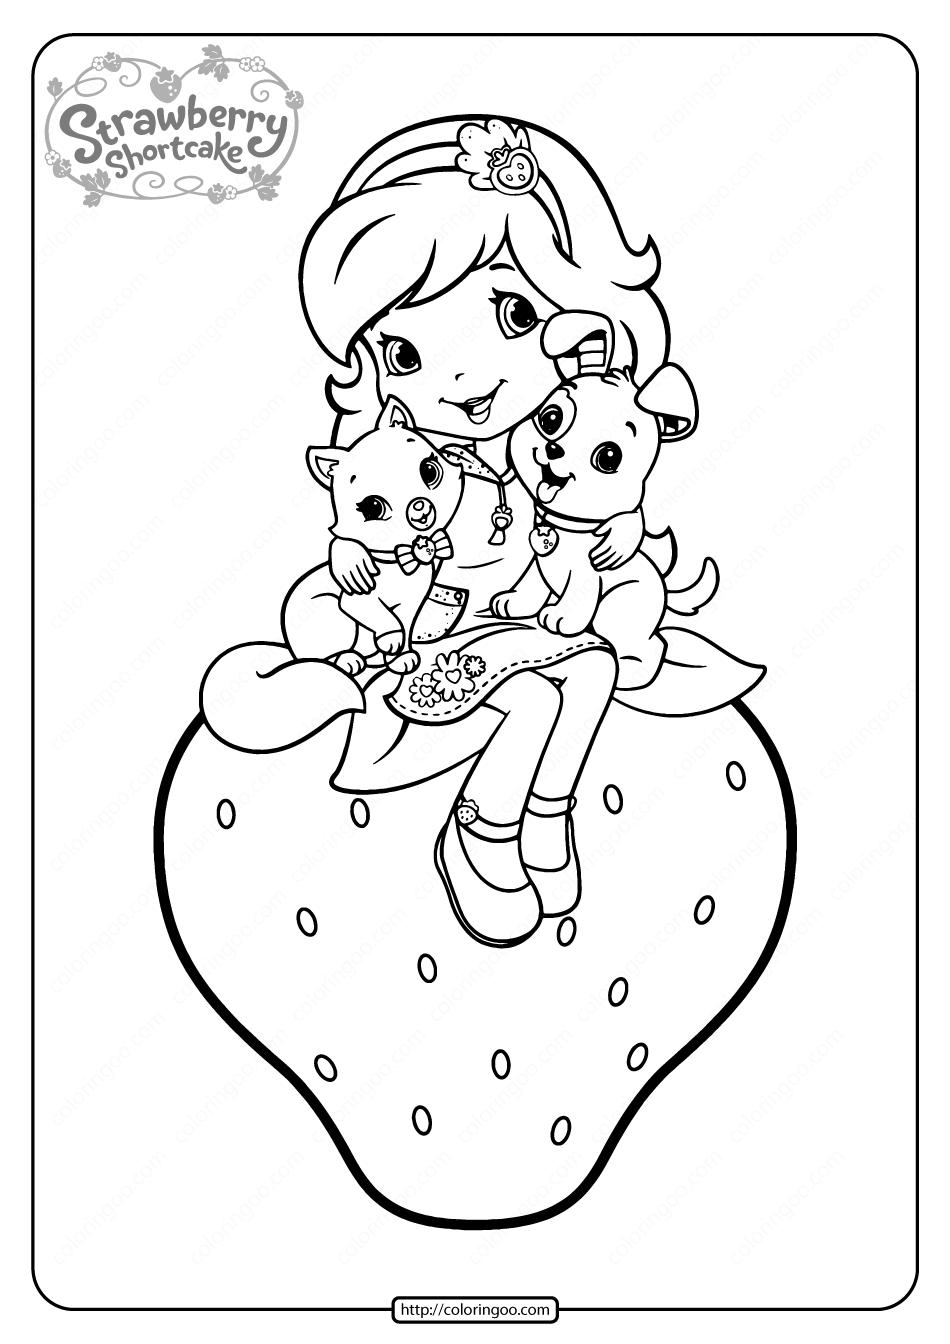 Free Printable Strawberry Shortcake Coloring Page 08